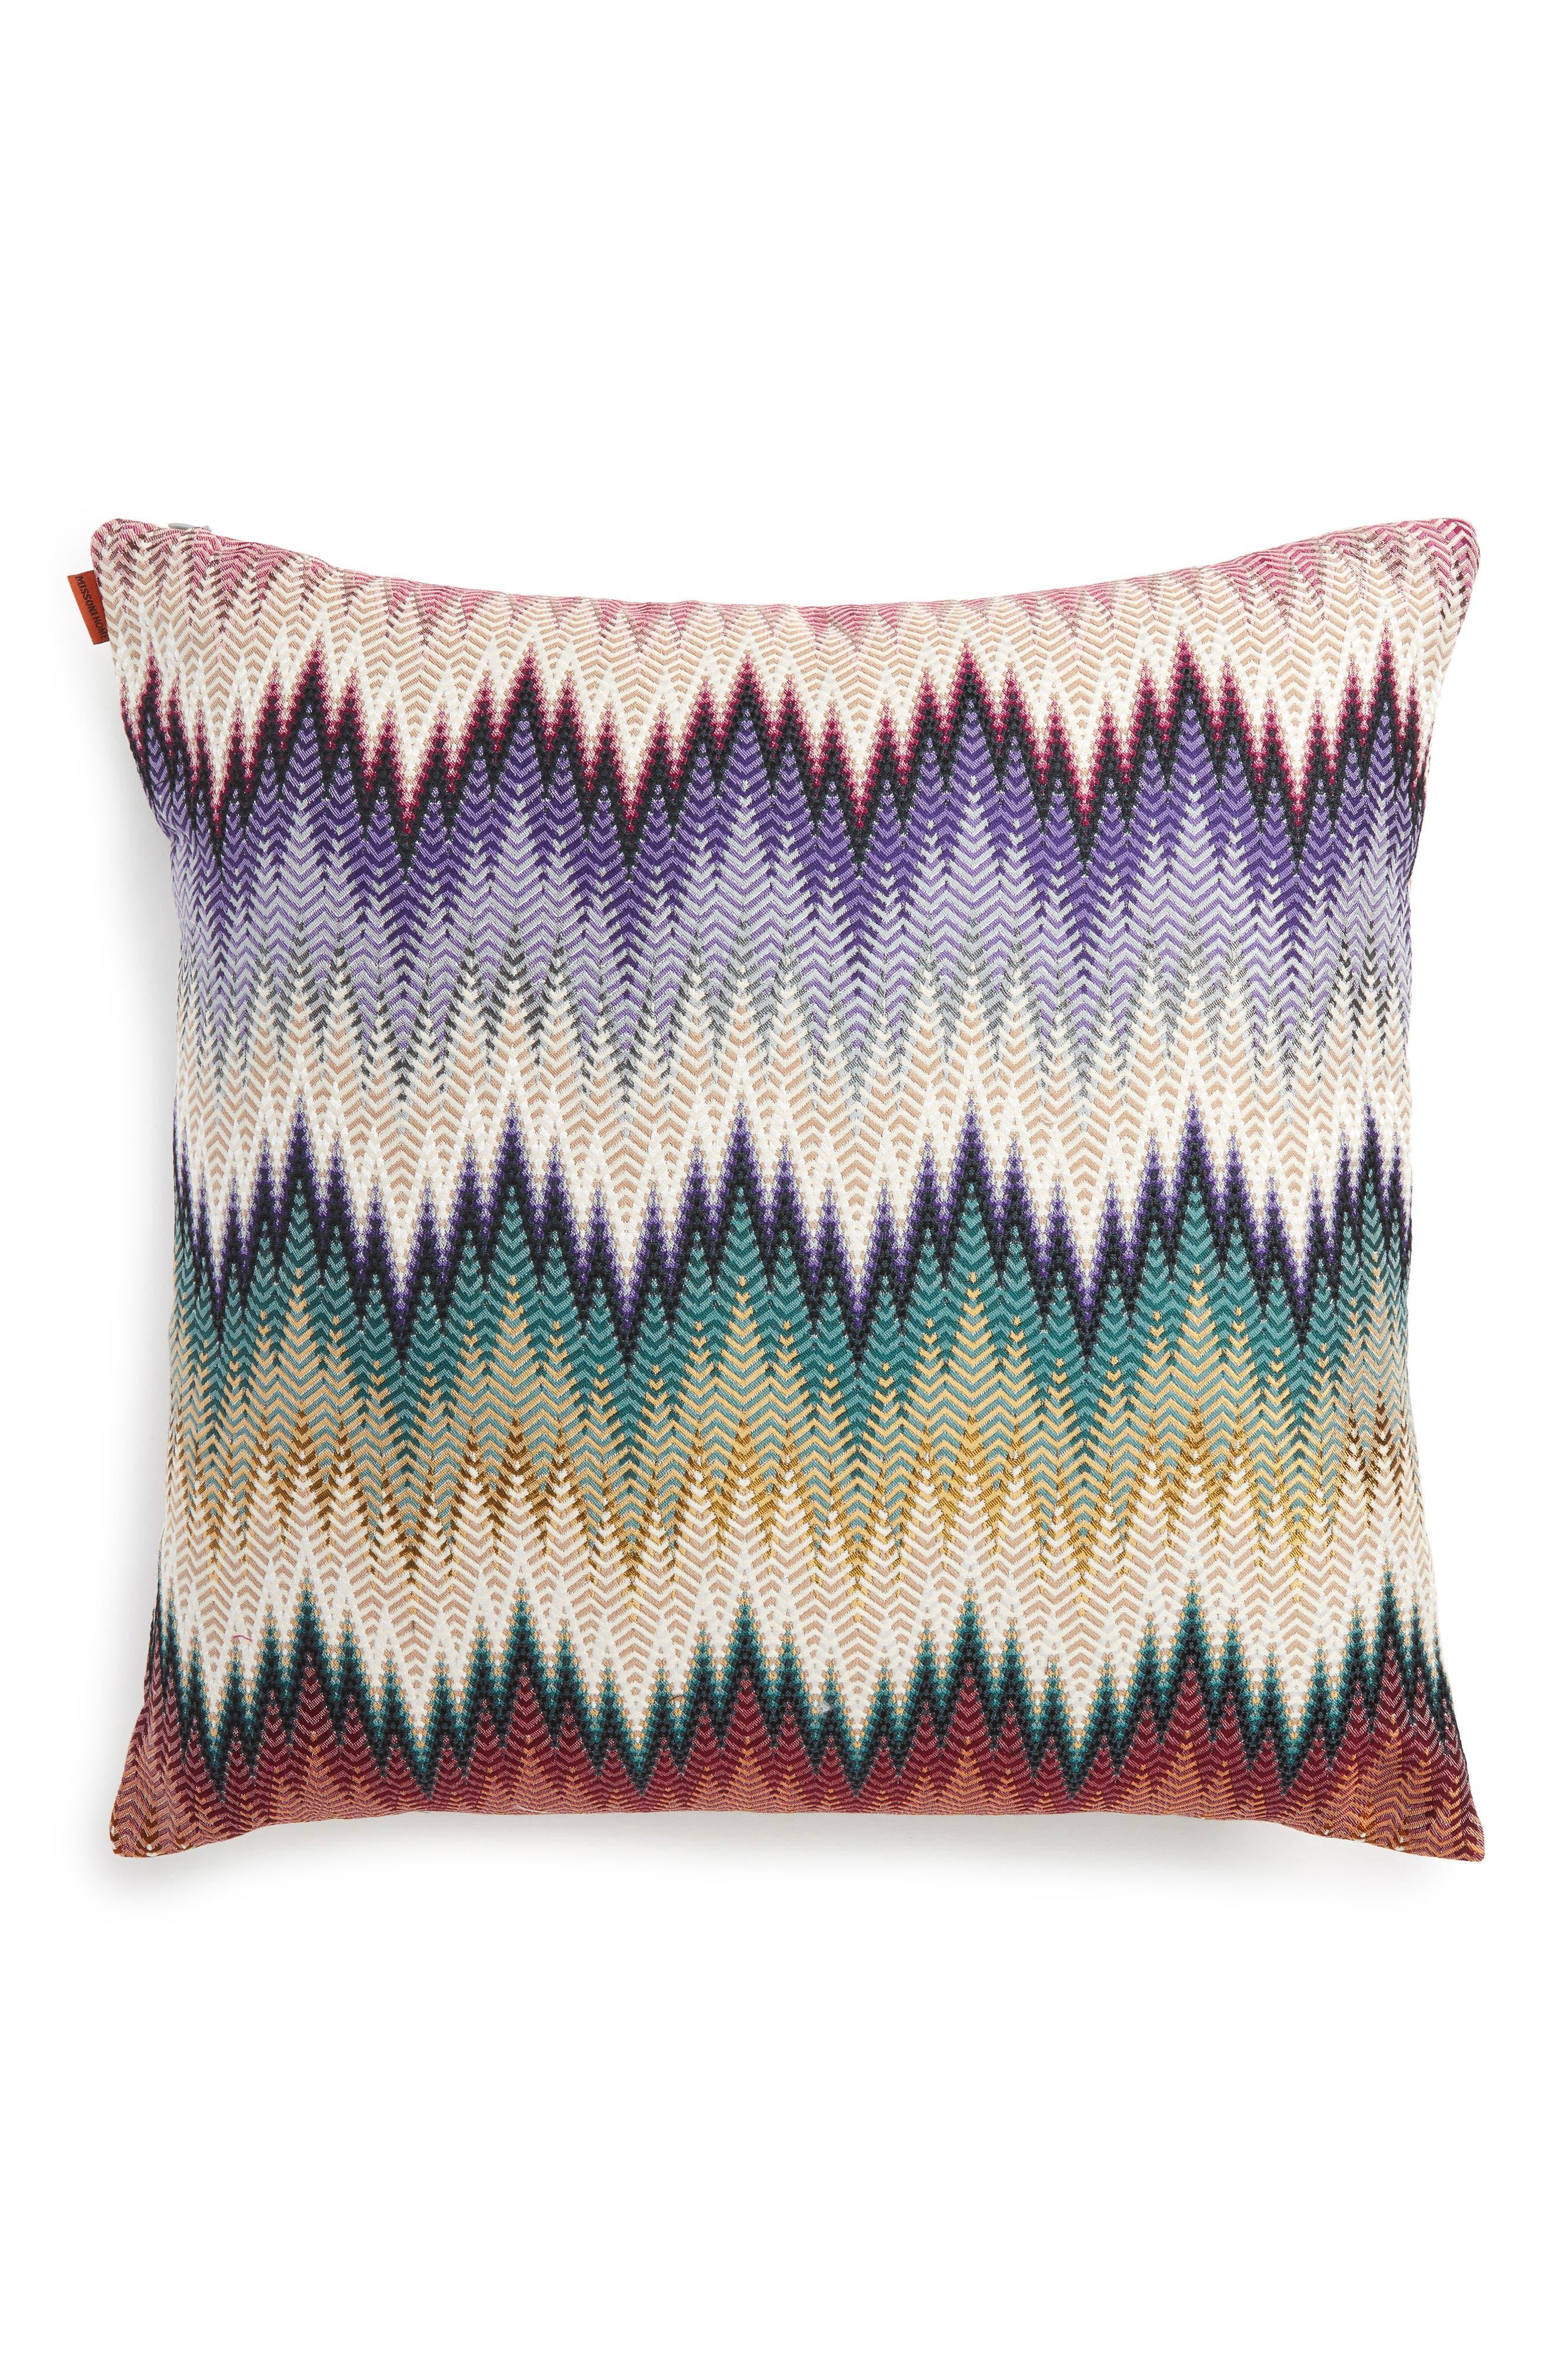 Phrae Accent Pillow,                         Main,                         color, Multi Color